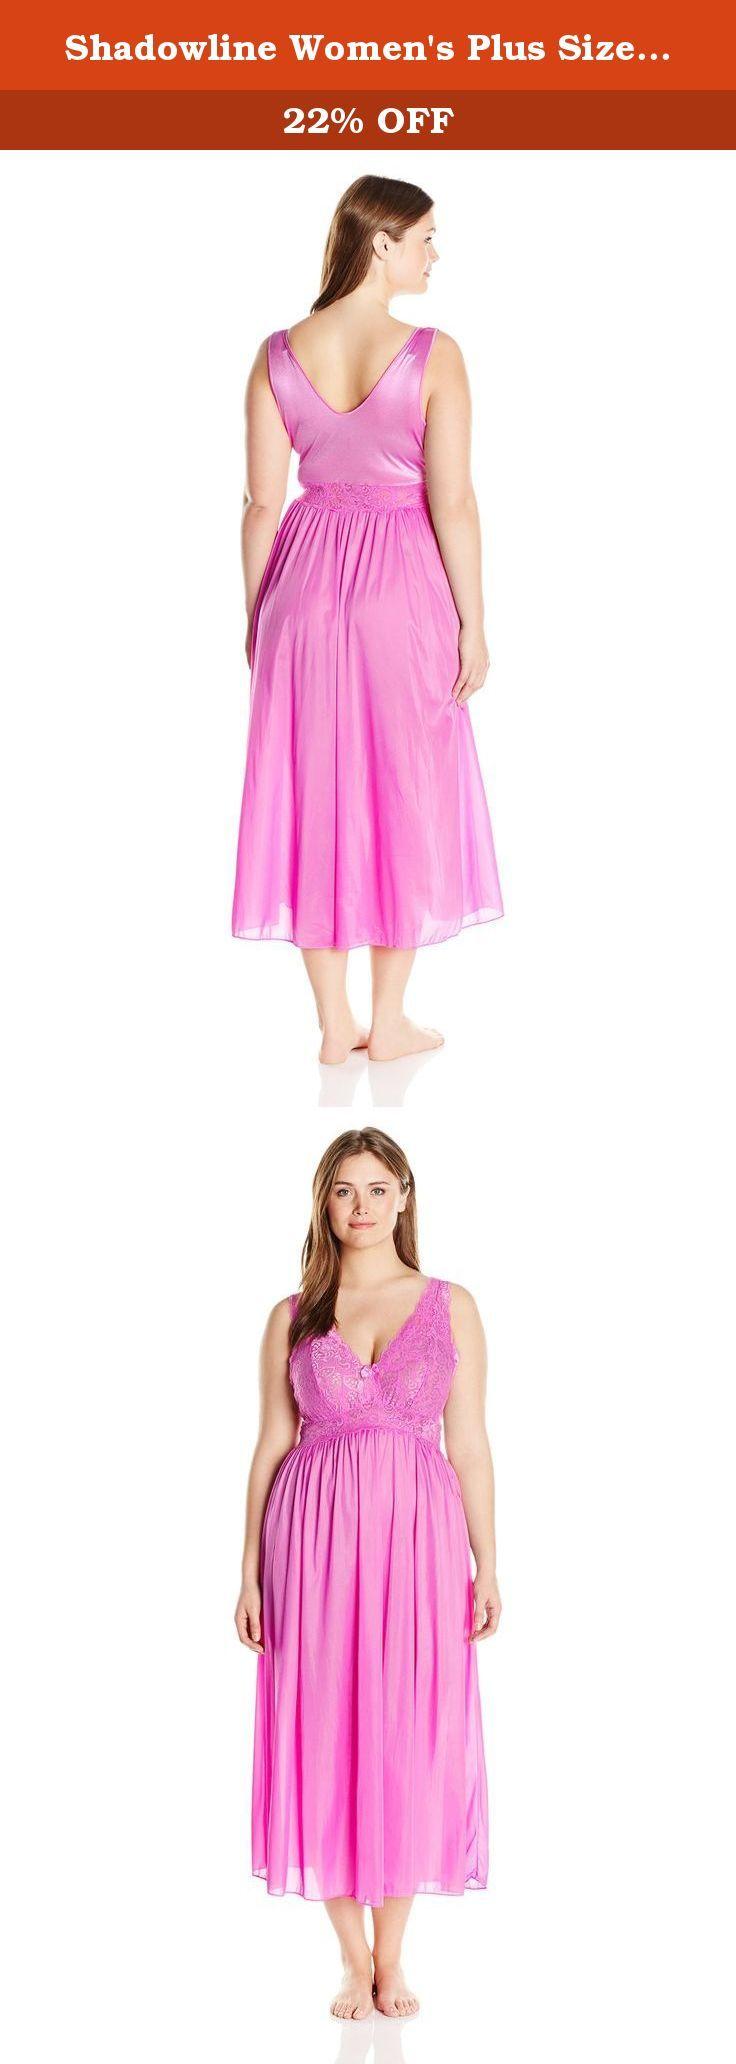 736x2064 Shadowline Women's Plus Size Silhouette 53 Sleeveless Long Gown